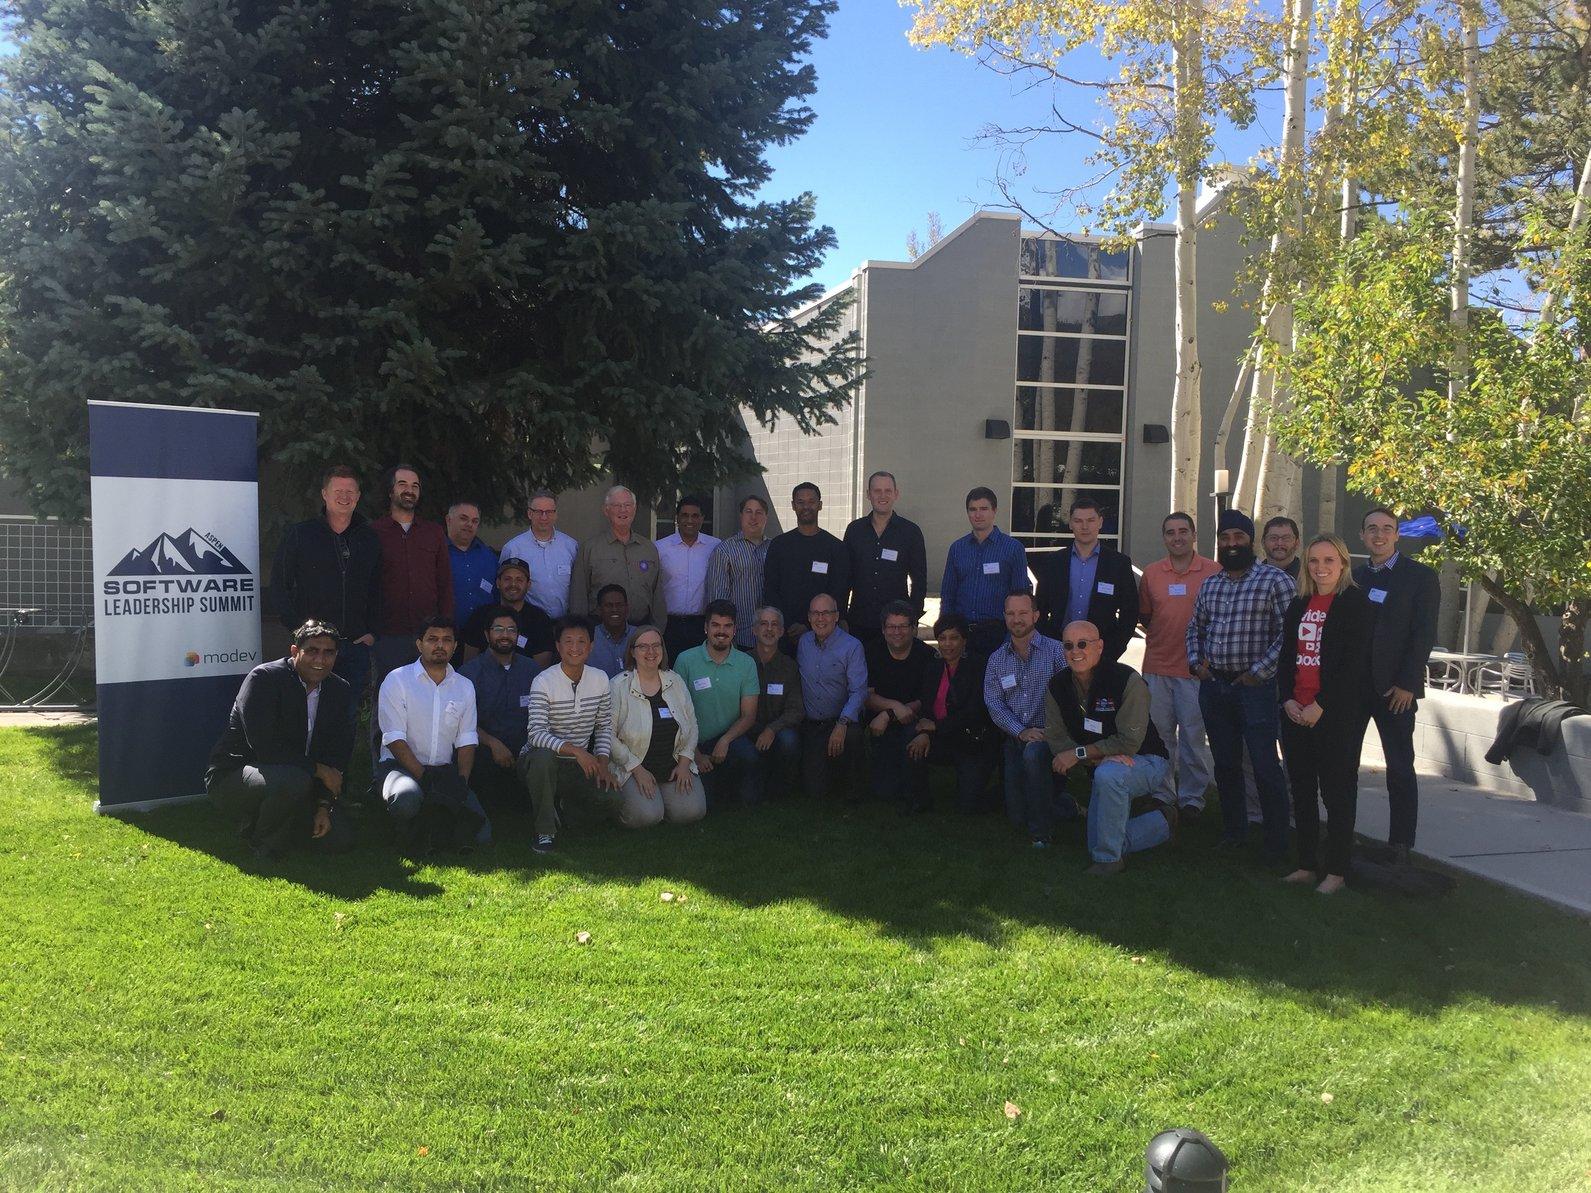 2015 Aspen Software Leadership Summit